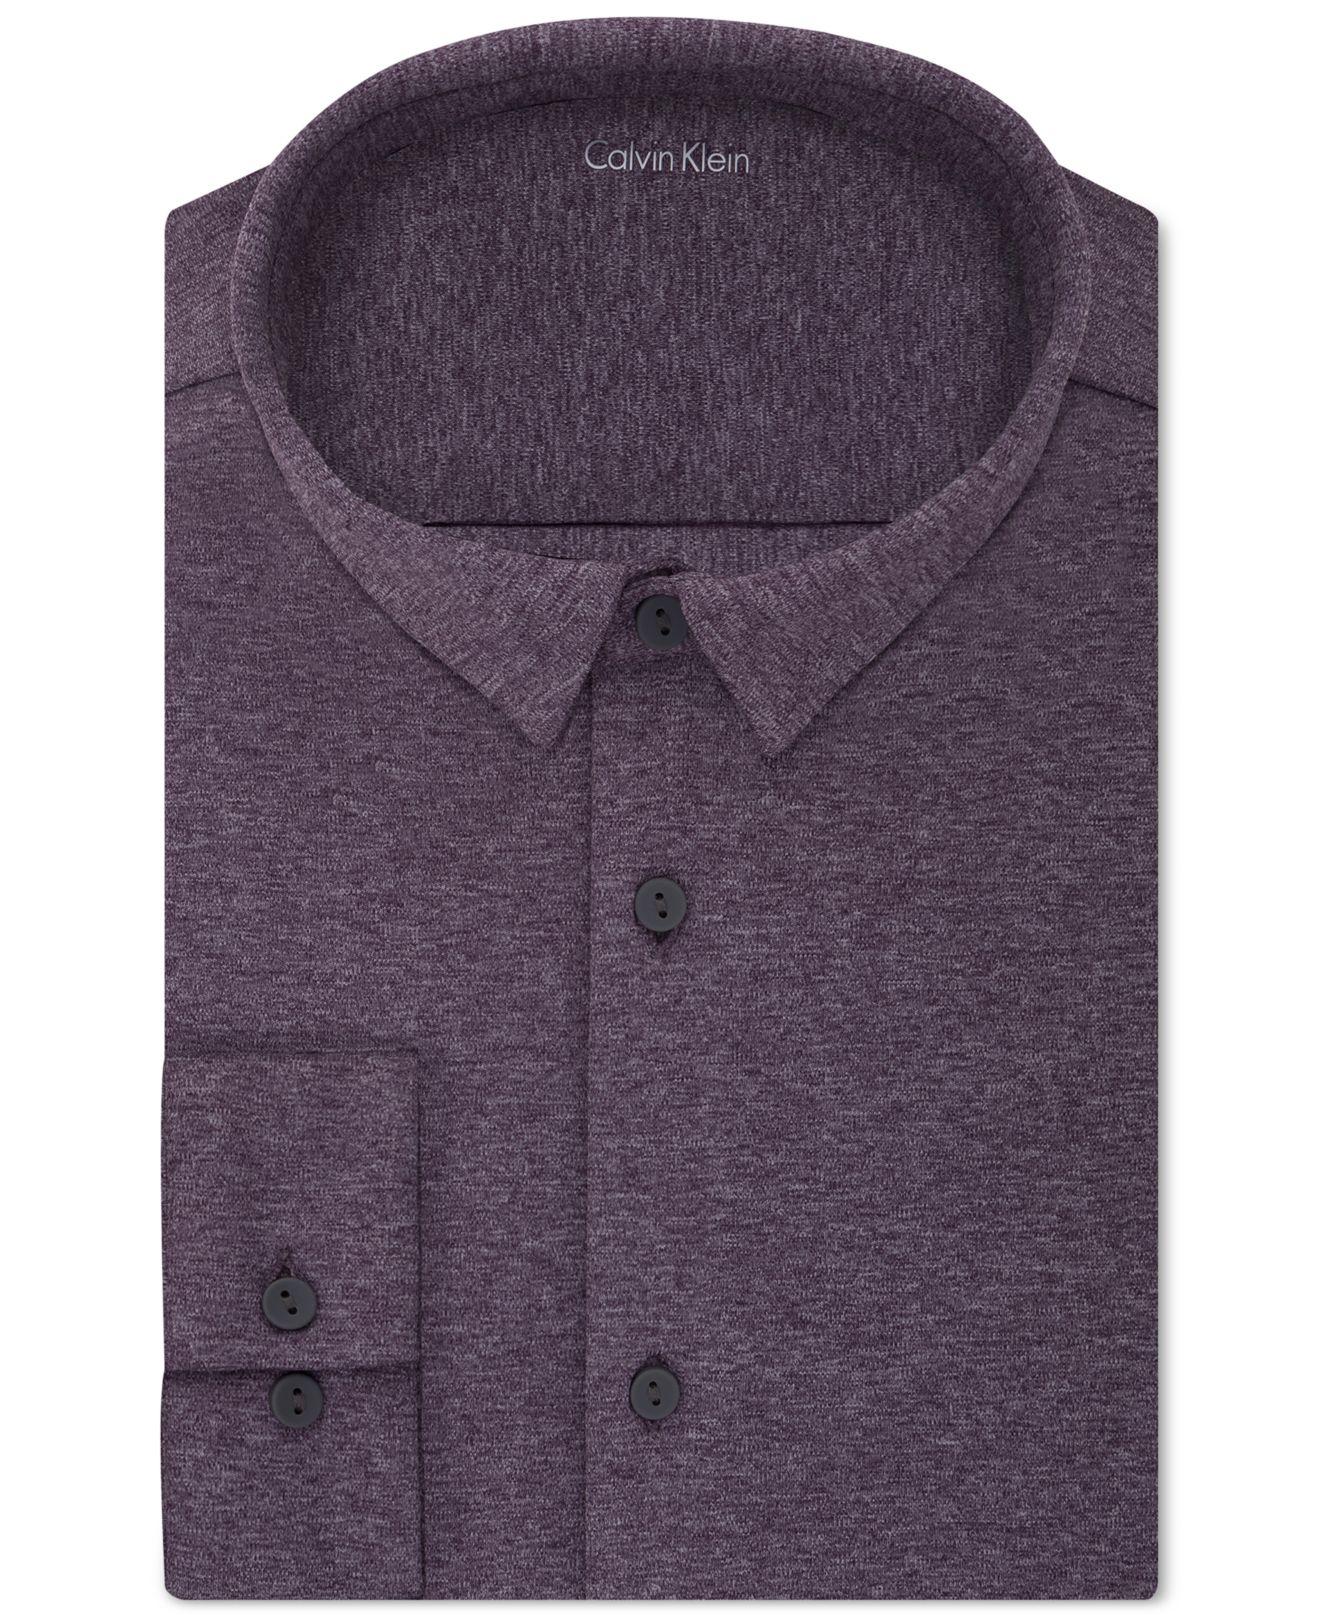 Calvin klein men 39 s slim fit infinite stretch knit dress for Calvin klein slim fit stretch shirt